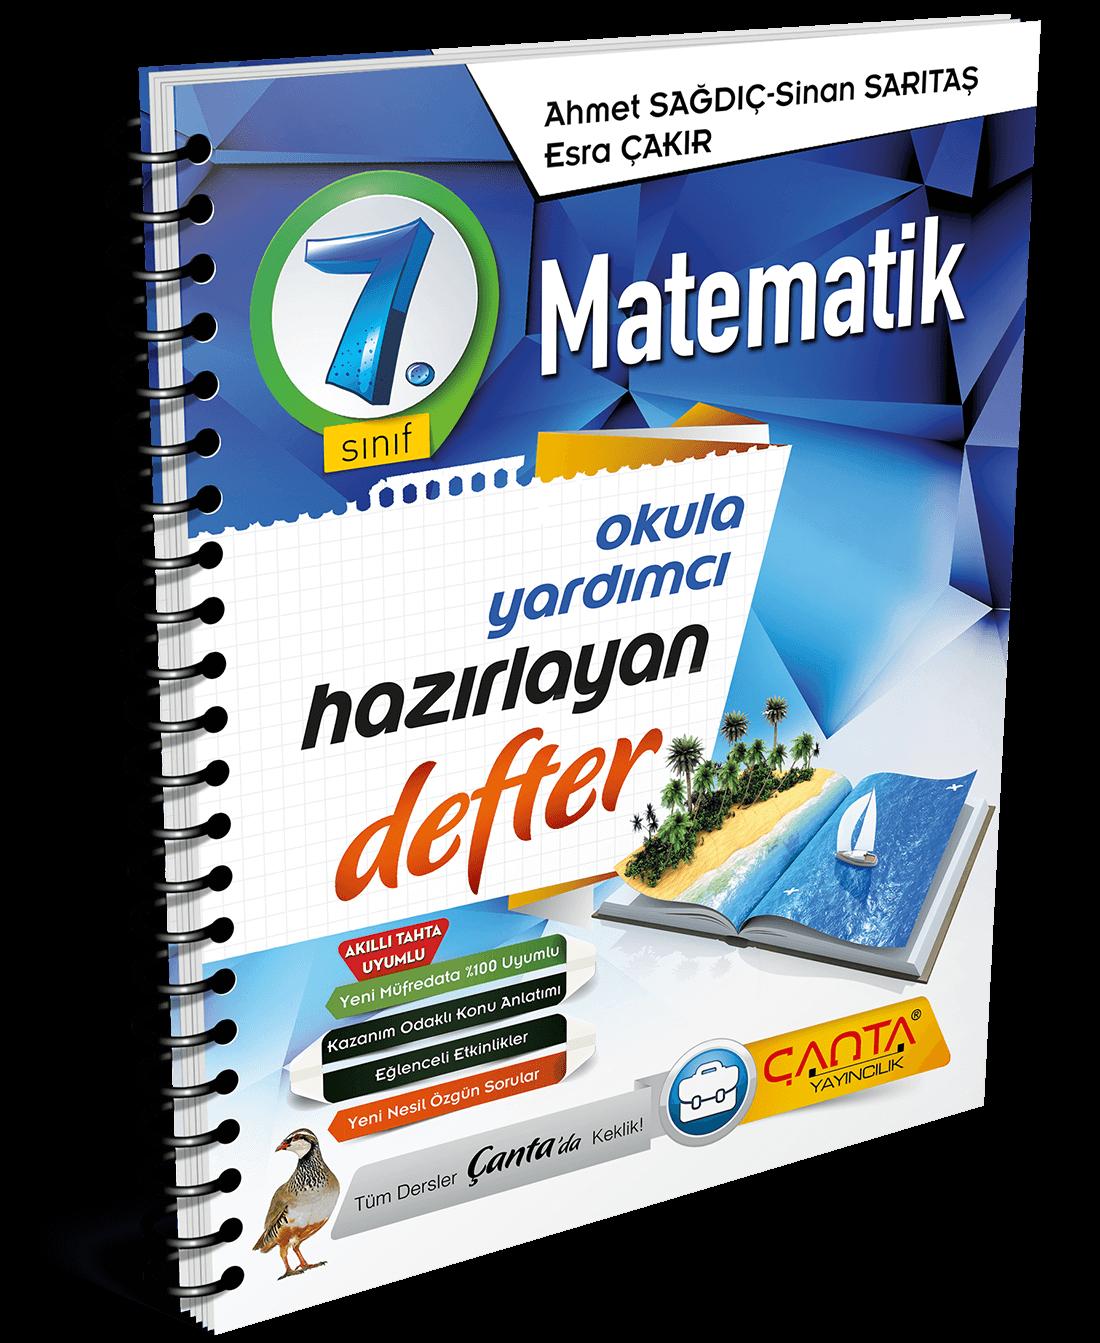 7. Sınıf – Matematik Hazırlayan Defter